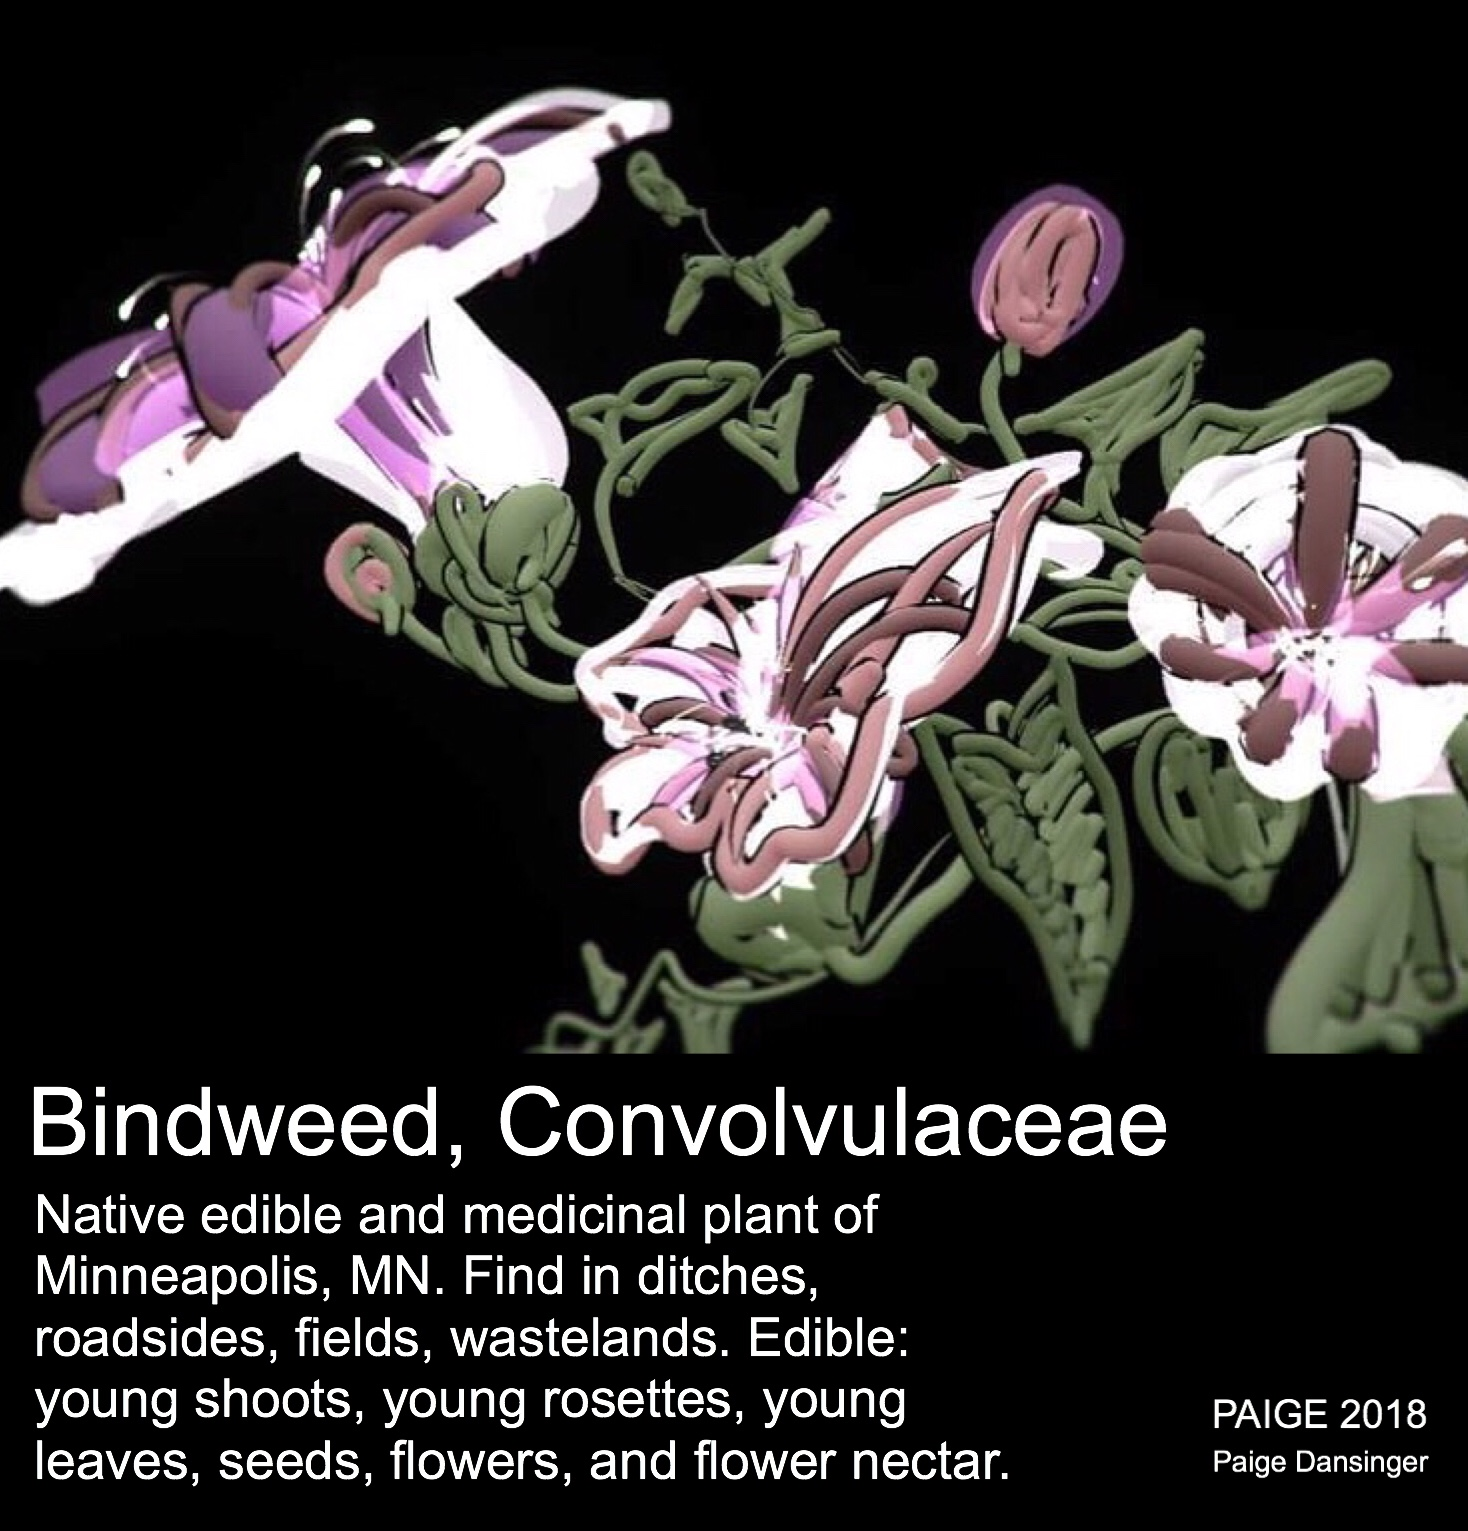 Bindweed, Convolvulva. After Lady Wilkinson's Weeds & Wildflowers, 1885.